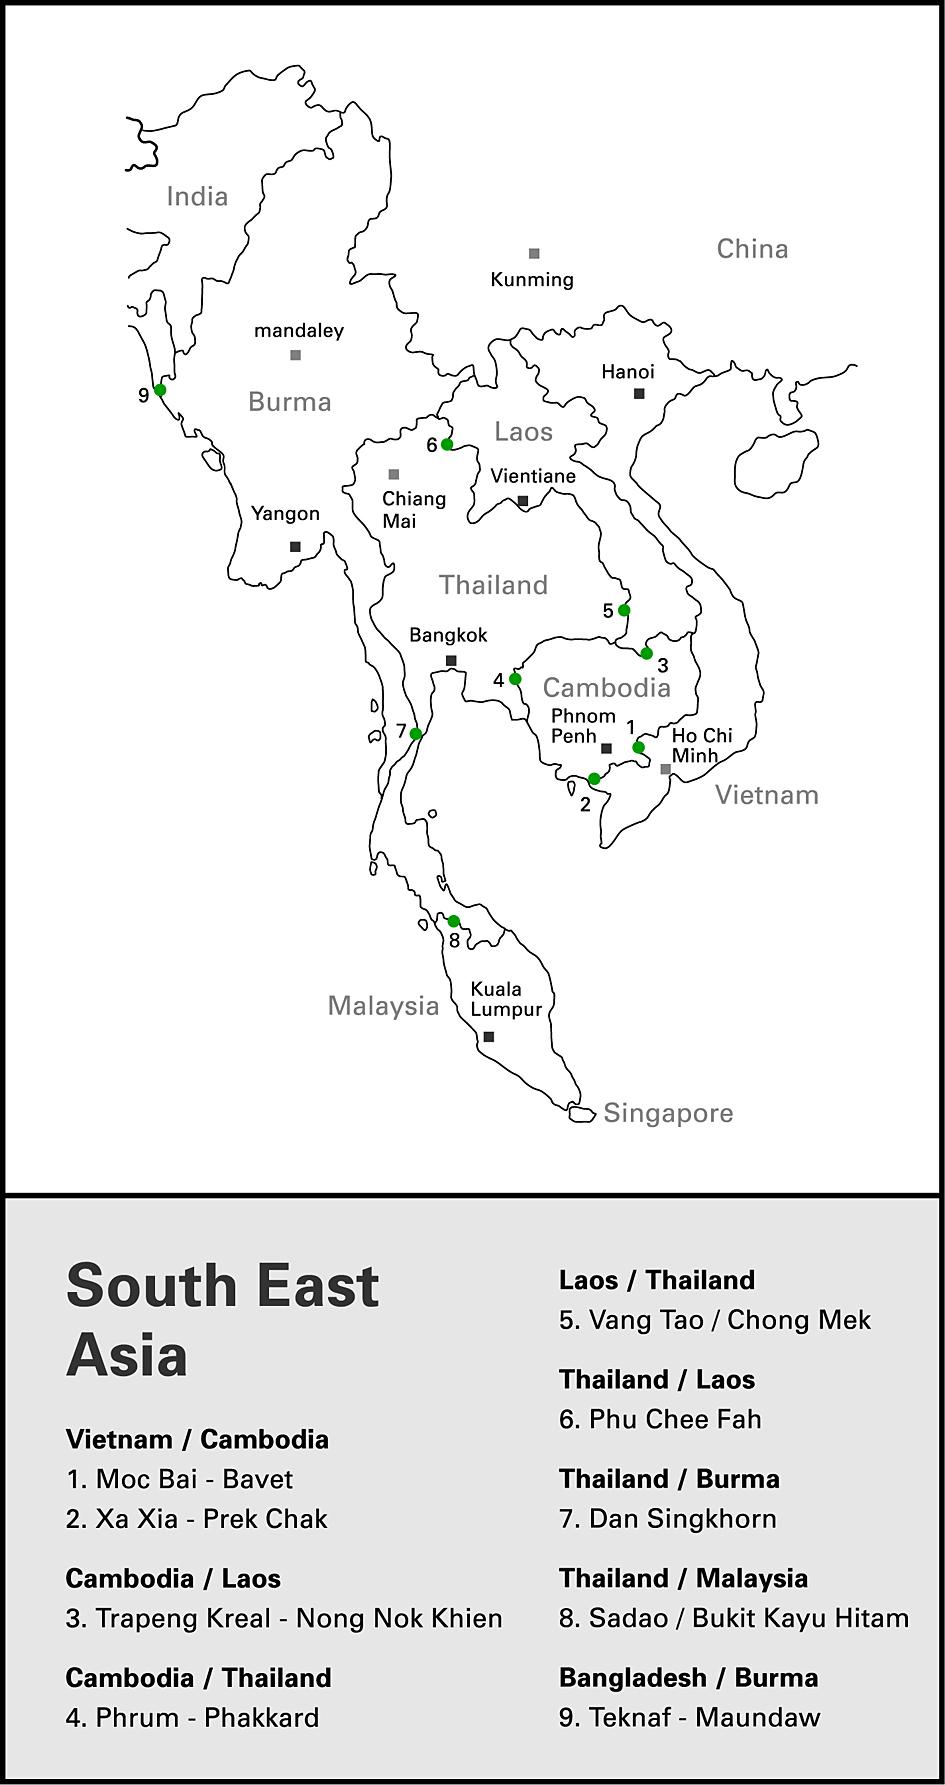 map-border-SouthEast-asia-2011.jpg